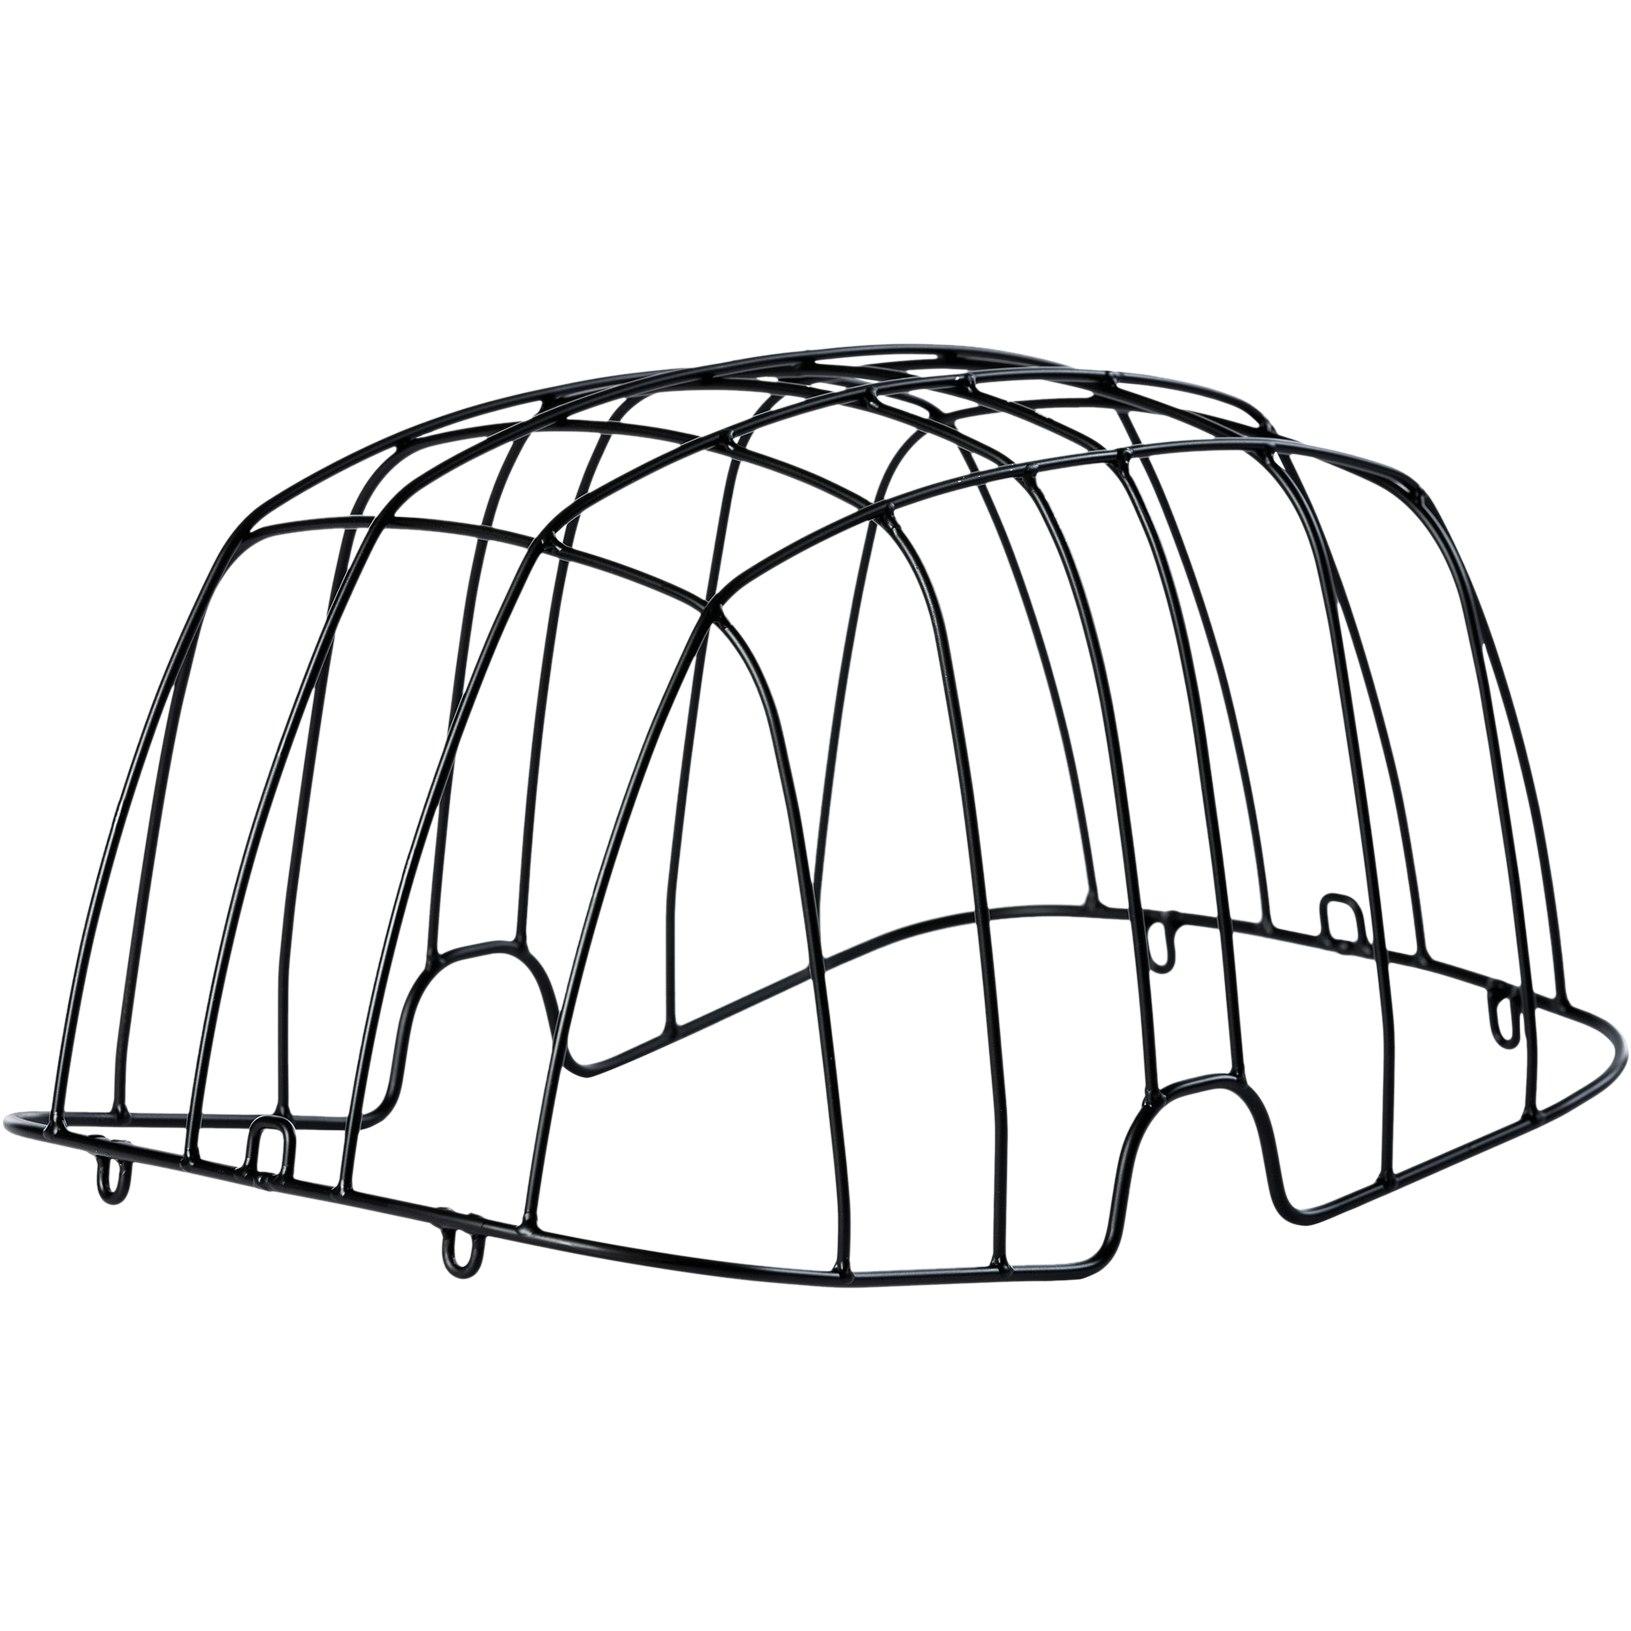 Basil Buddy Space Frame wire dome for dog bike basket Buddy - black